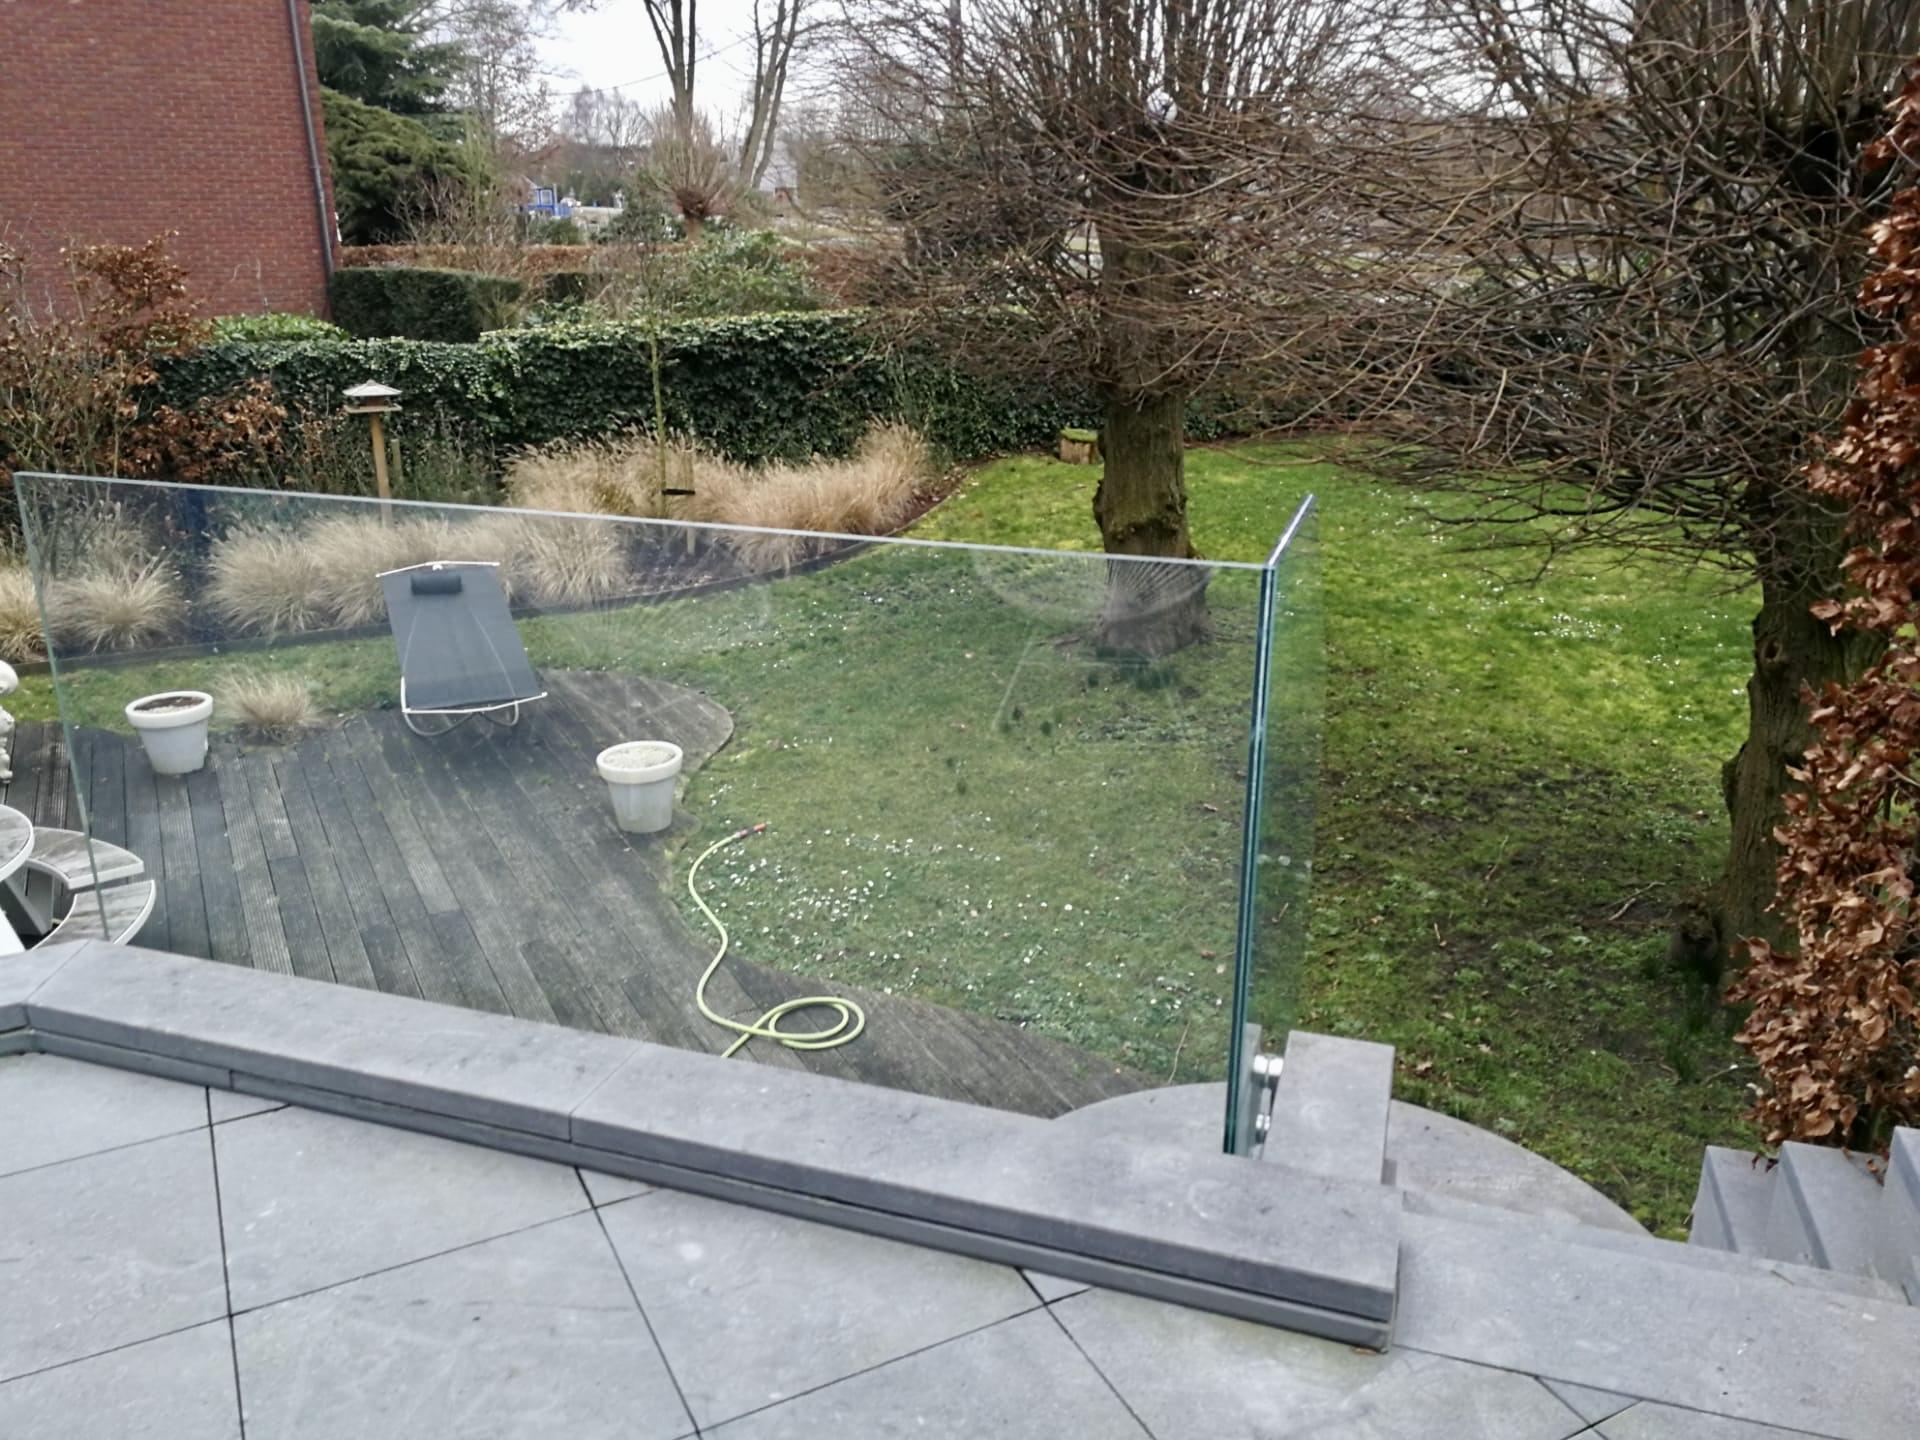 https://allglas.be/wp-content/uploads/2020/02/all-glas-walschaerts-bonheiden-glas-balustrade-buiten-09.jpeg